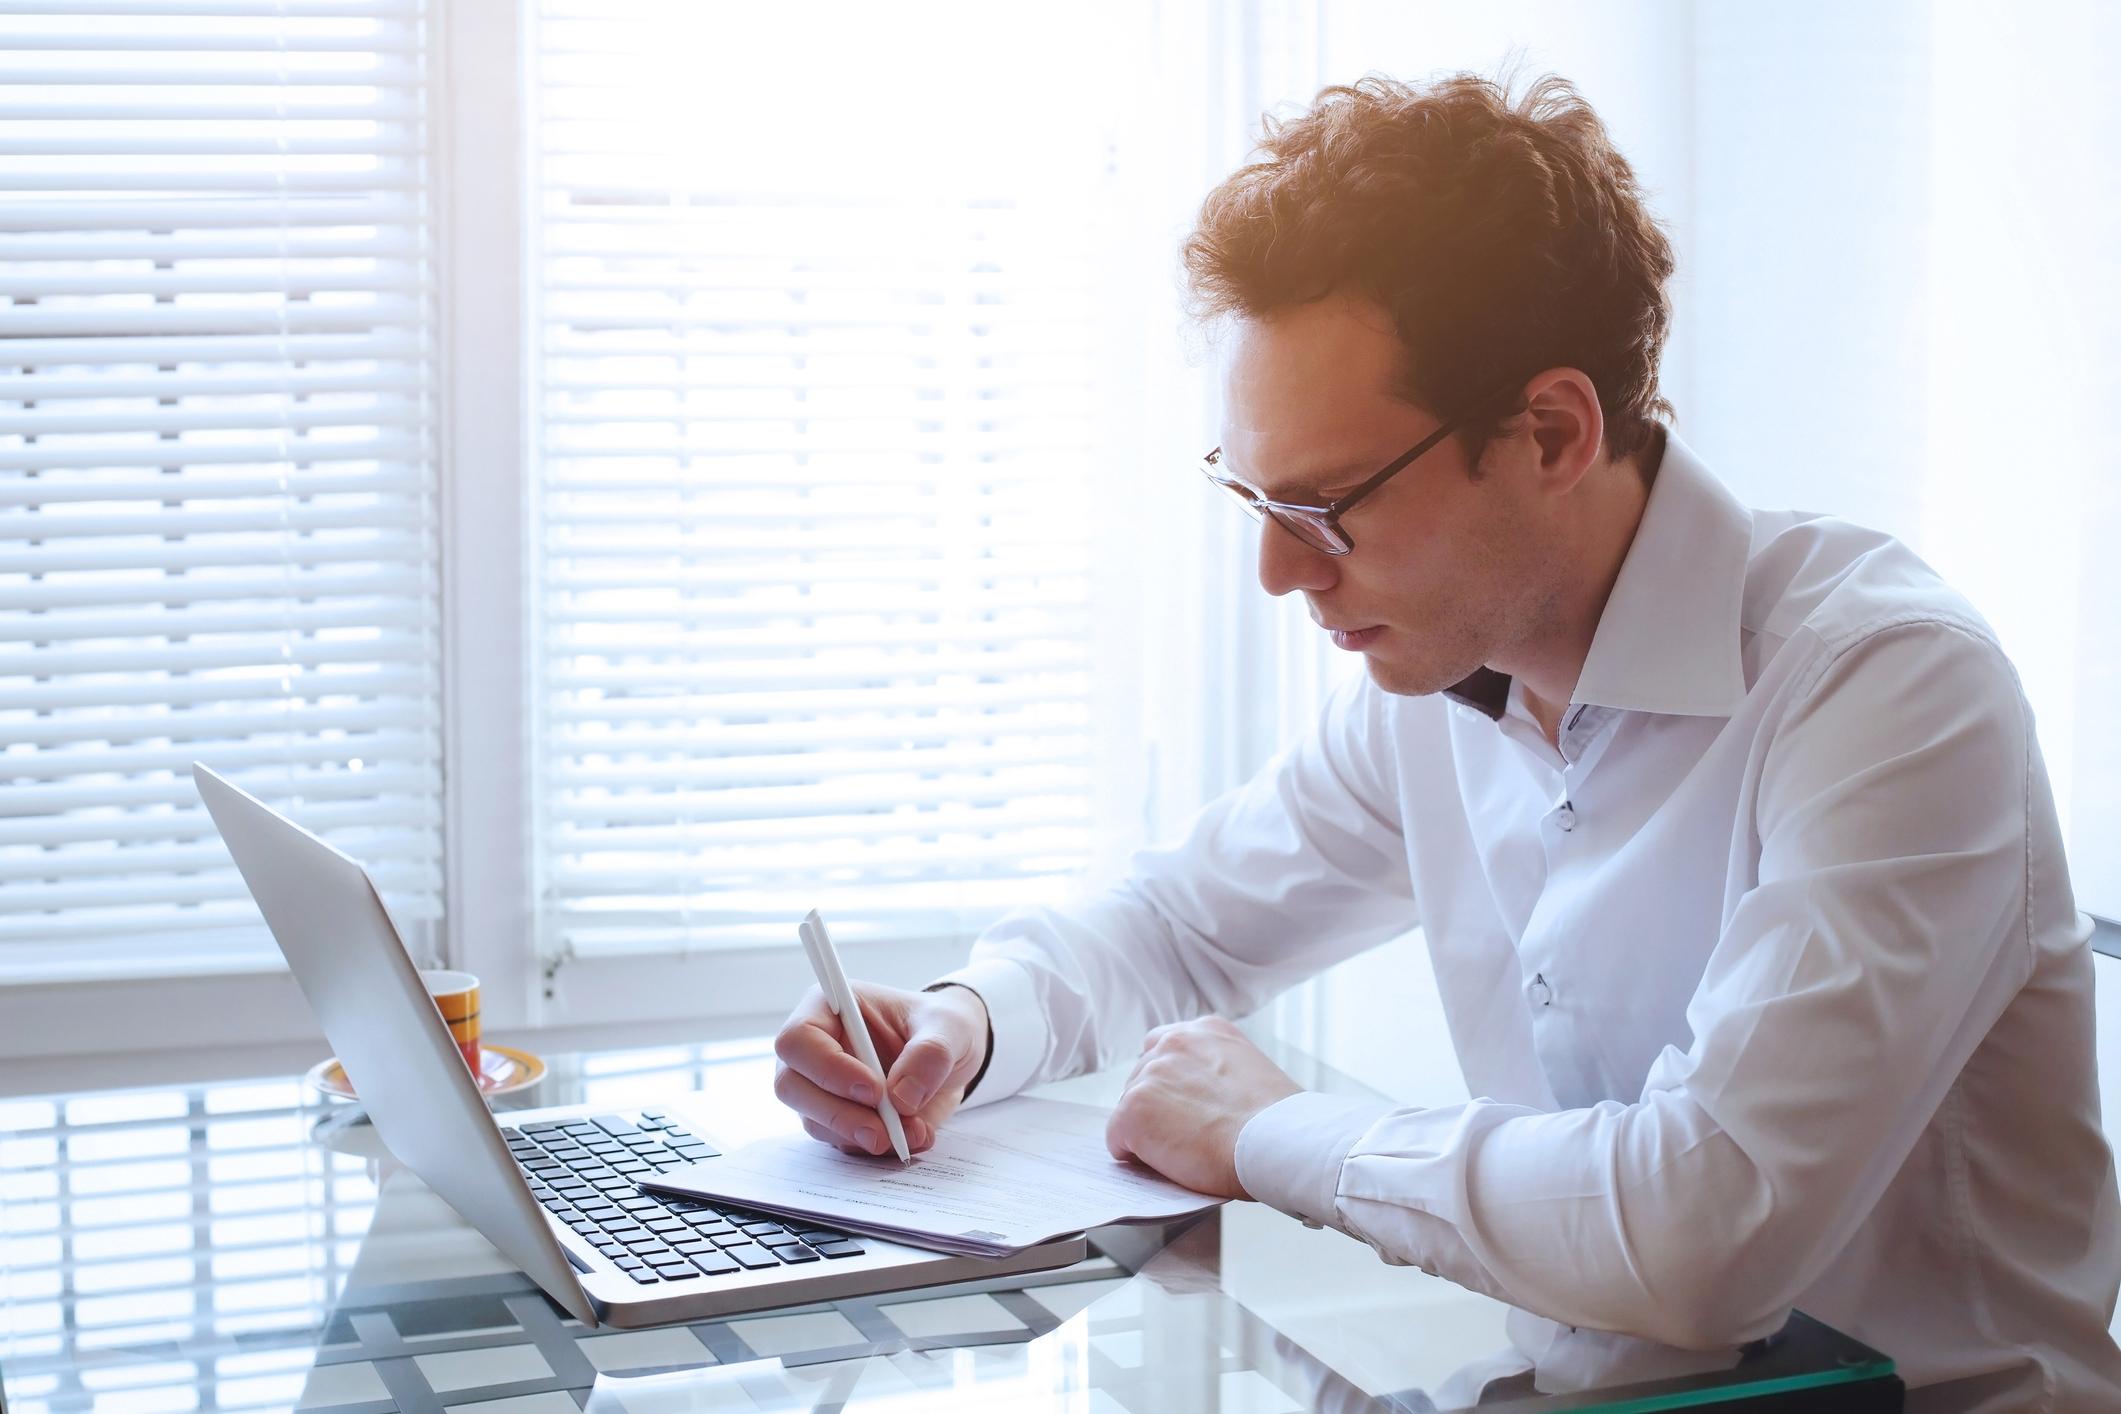 man reading on laptop